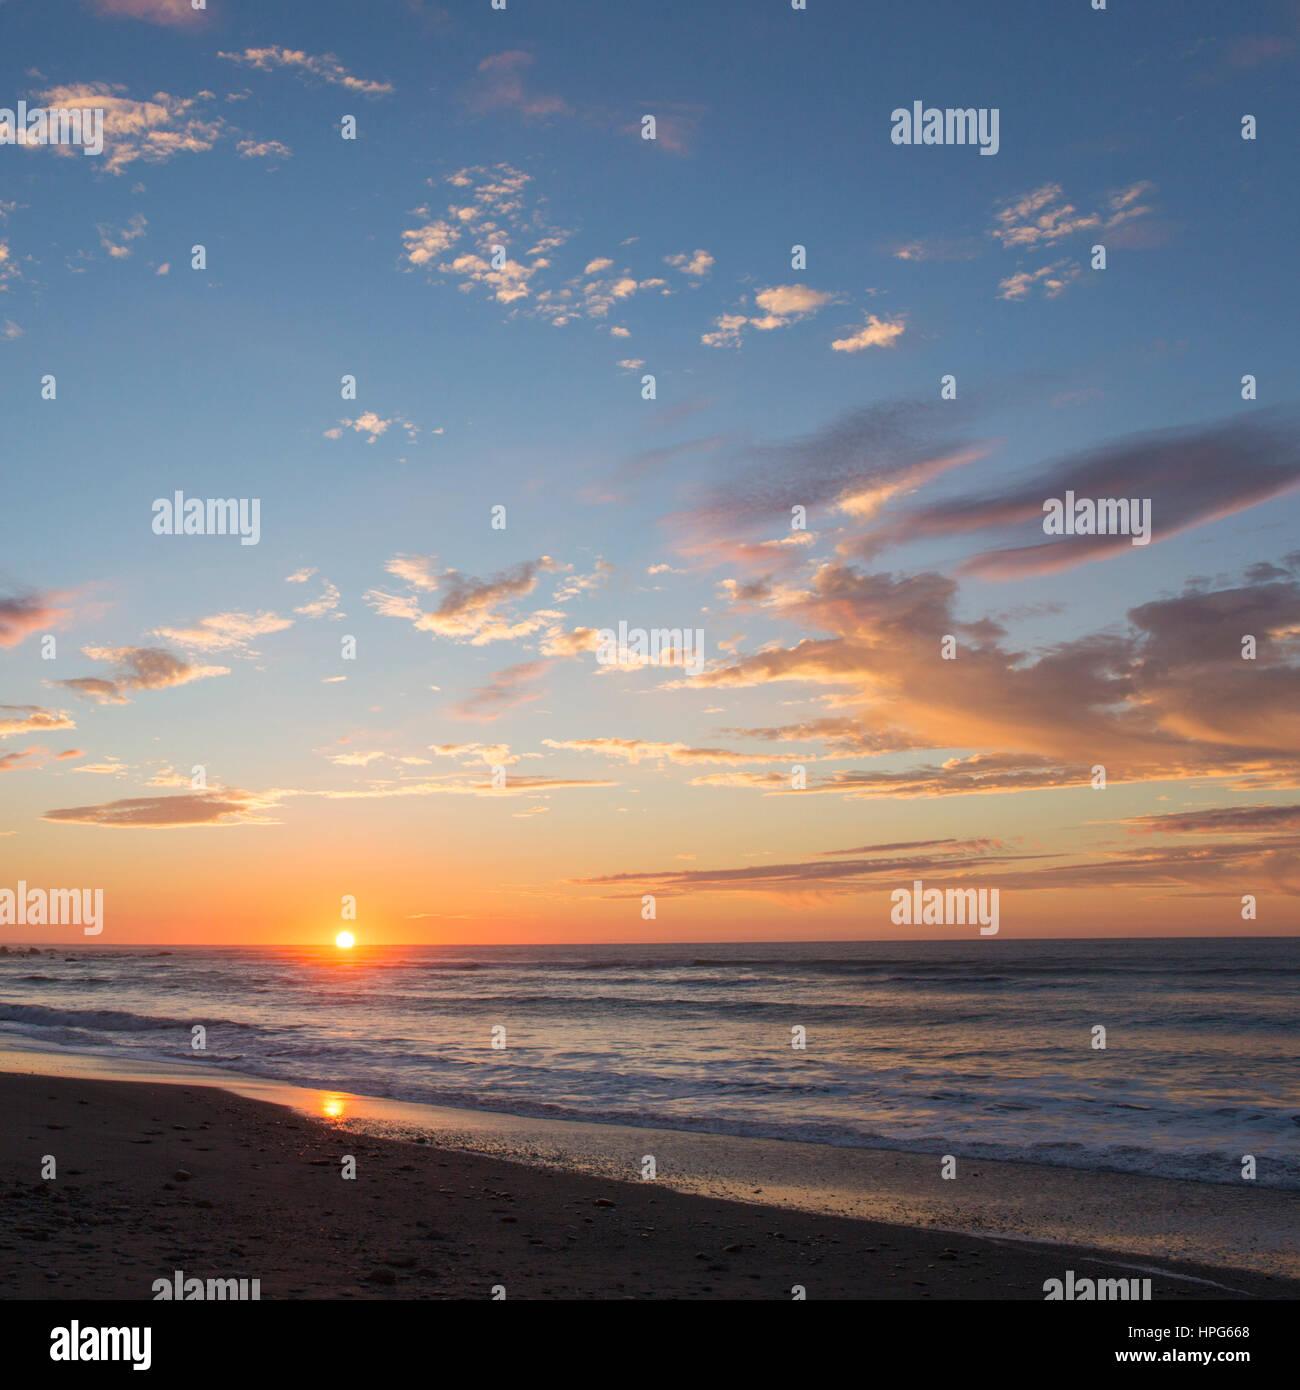 Okarito, Westland Tai Poutini National Park, West Coast, New Zealand. Colourful sunset over the Tasman Sea. Stock Photo